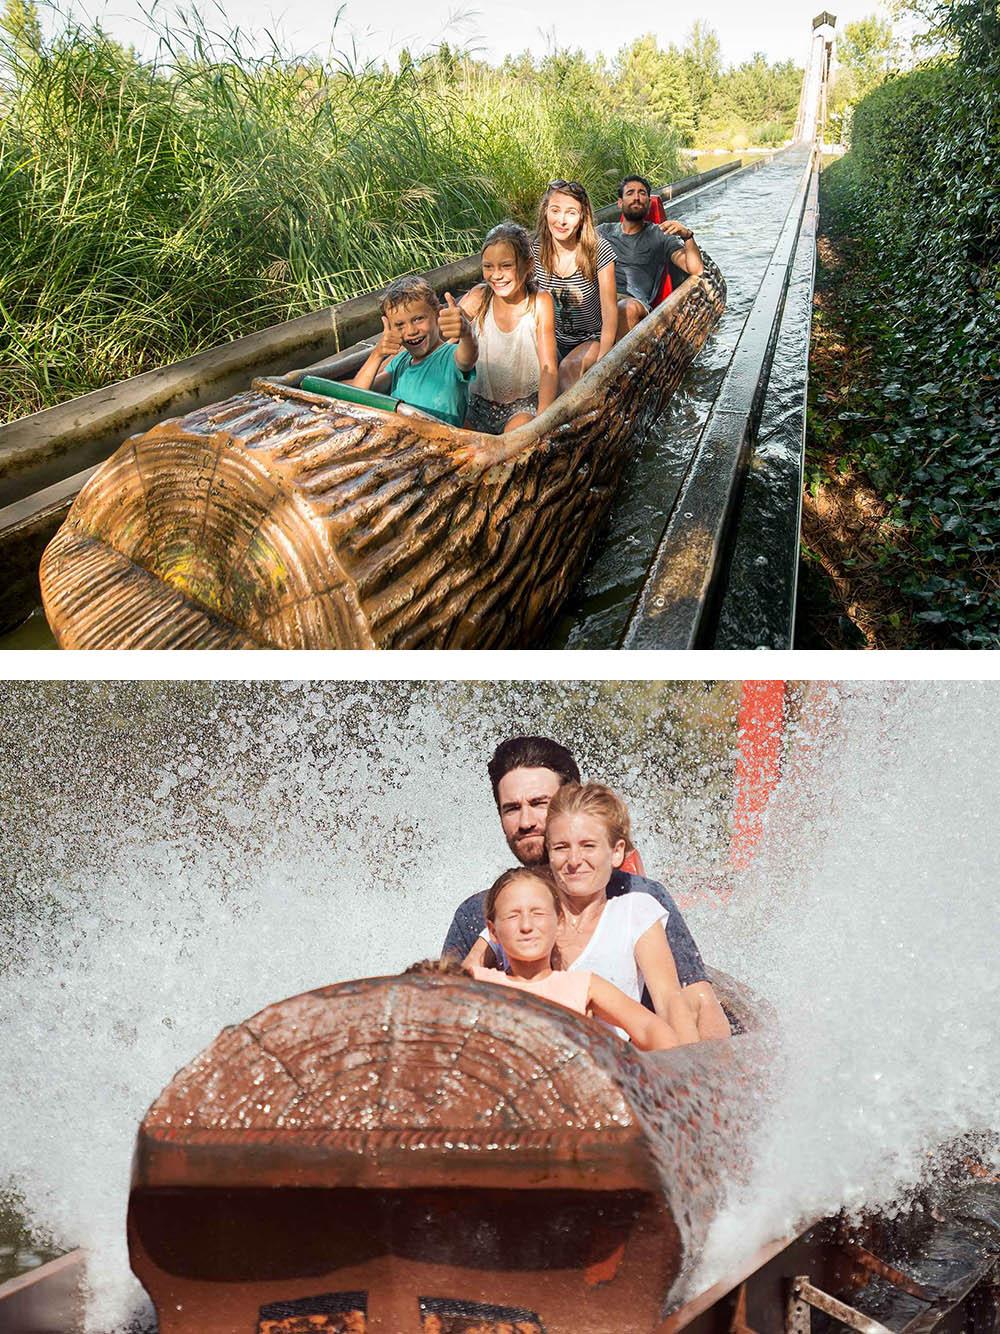 Interlink New Ride : Log Flume Drakkar at Walygator Sud-Ouest 7